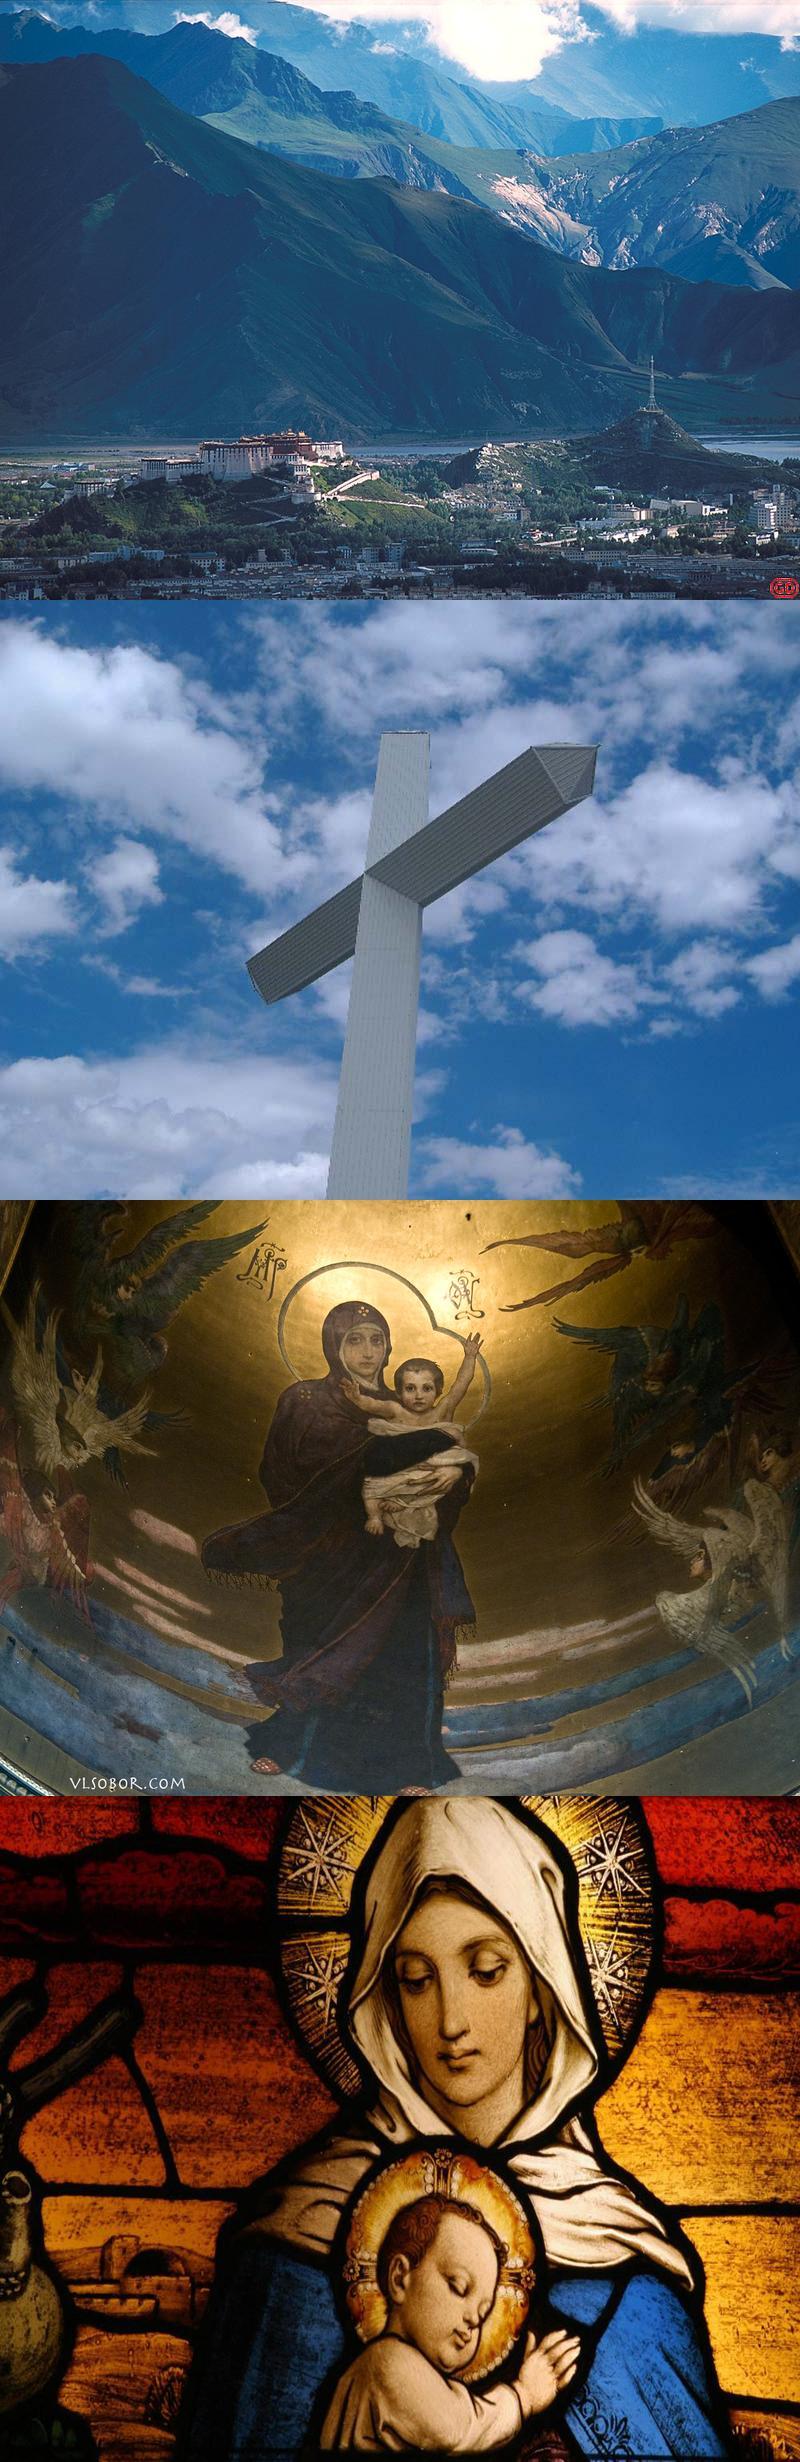 Madonna And Child Religious Pinterest Madonna